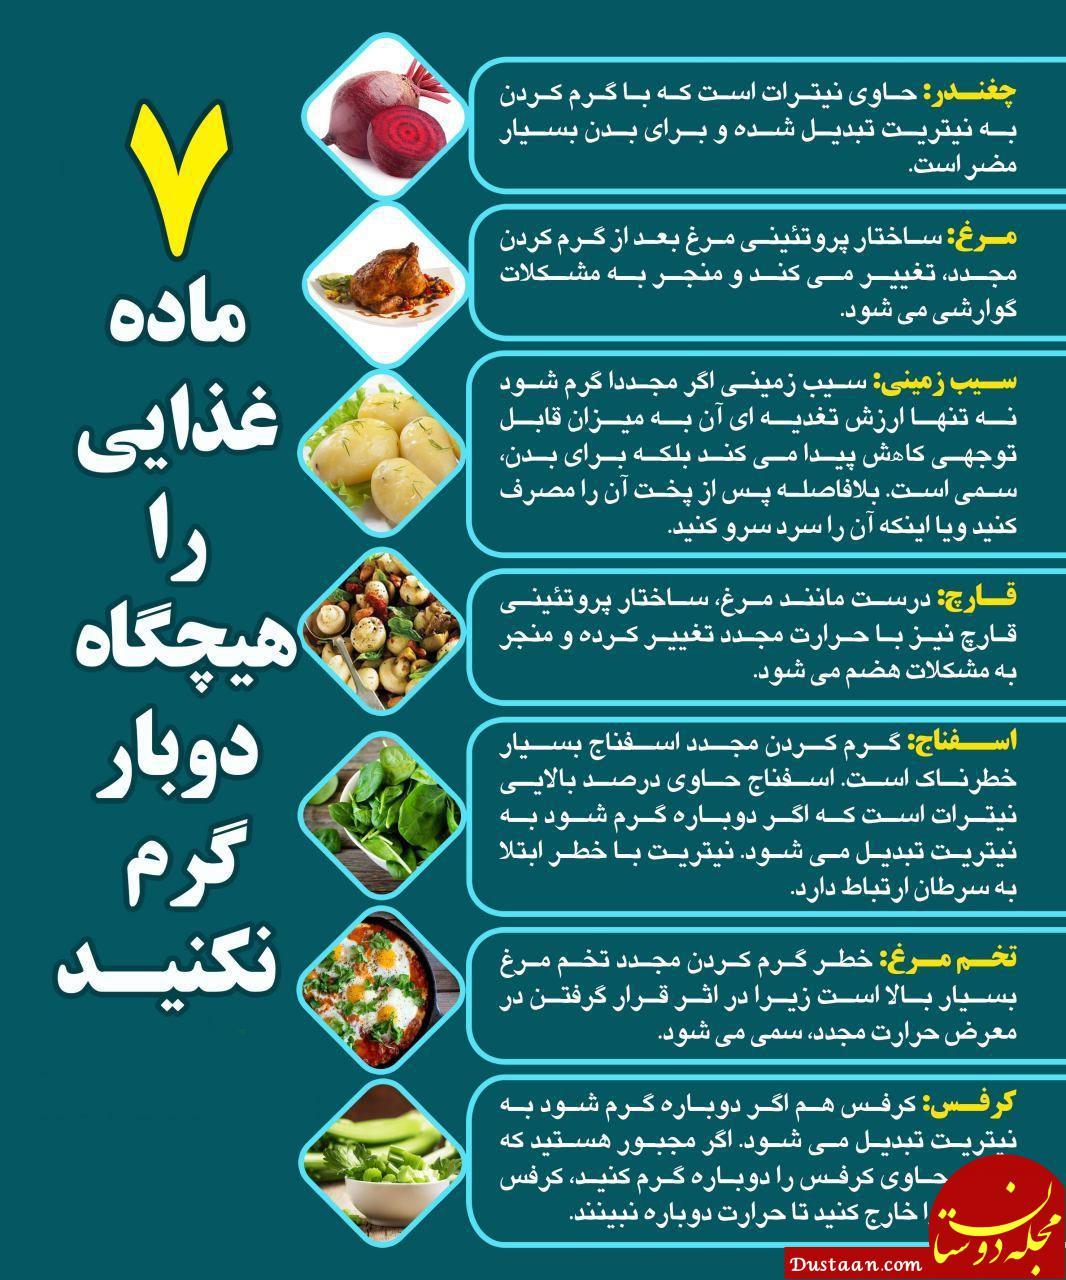 www.dustaan.com این هفت ماده غذایی را هیچگاه دوبار گرم نکنید